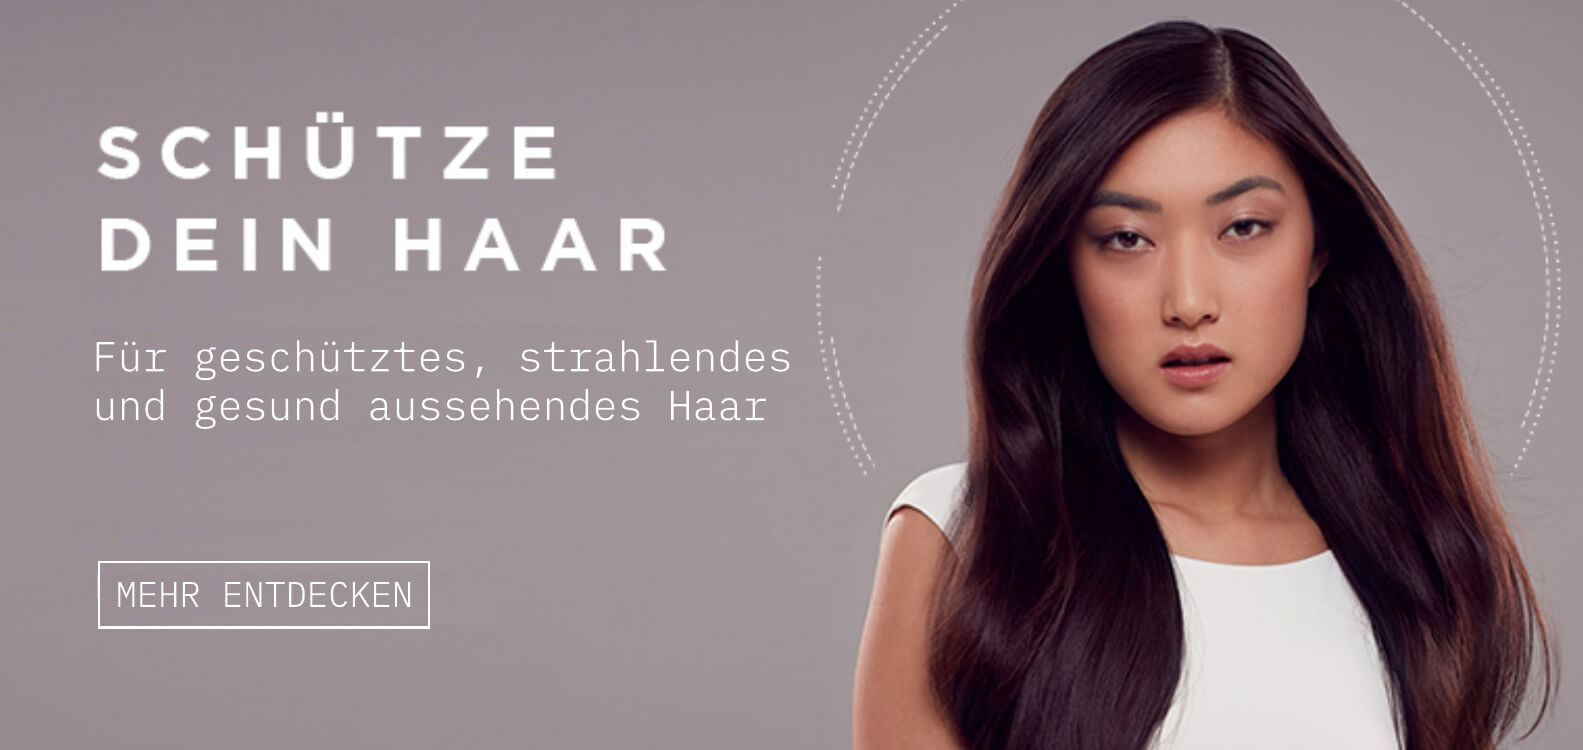 Schuetze dein Haar - Grow Gorgeous DE